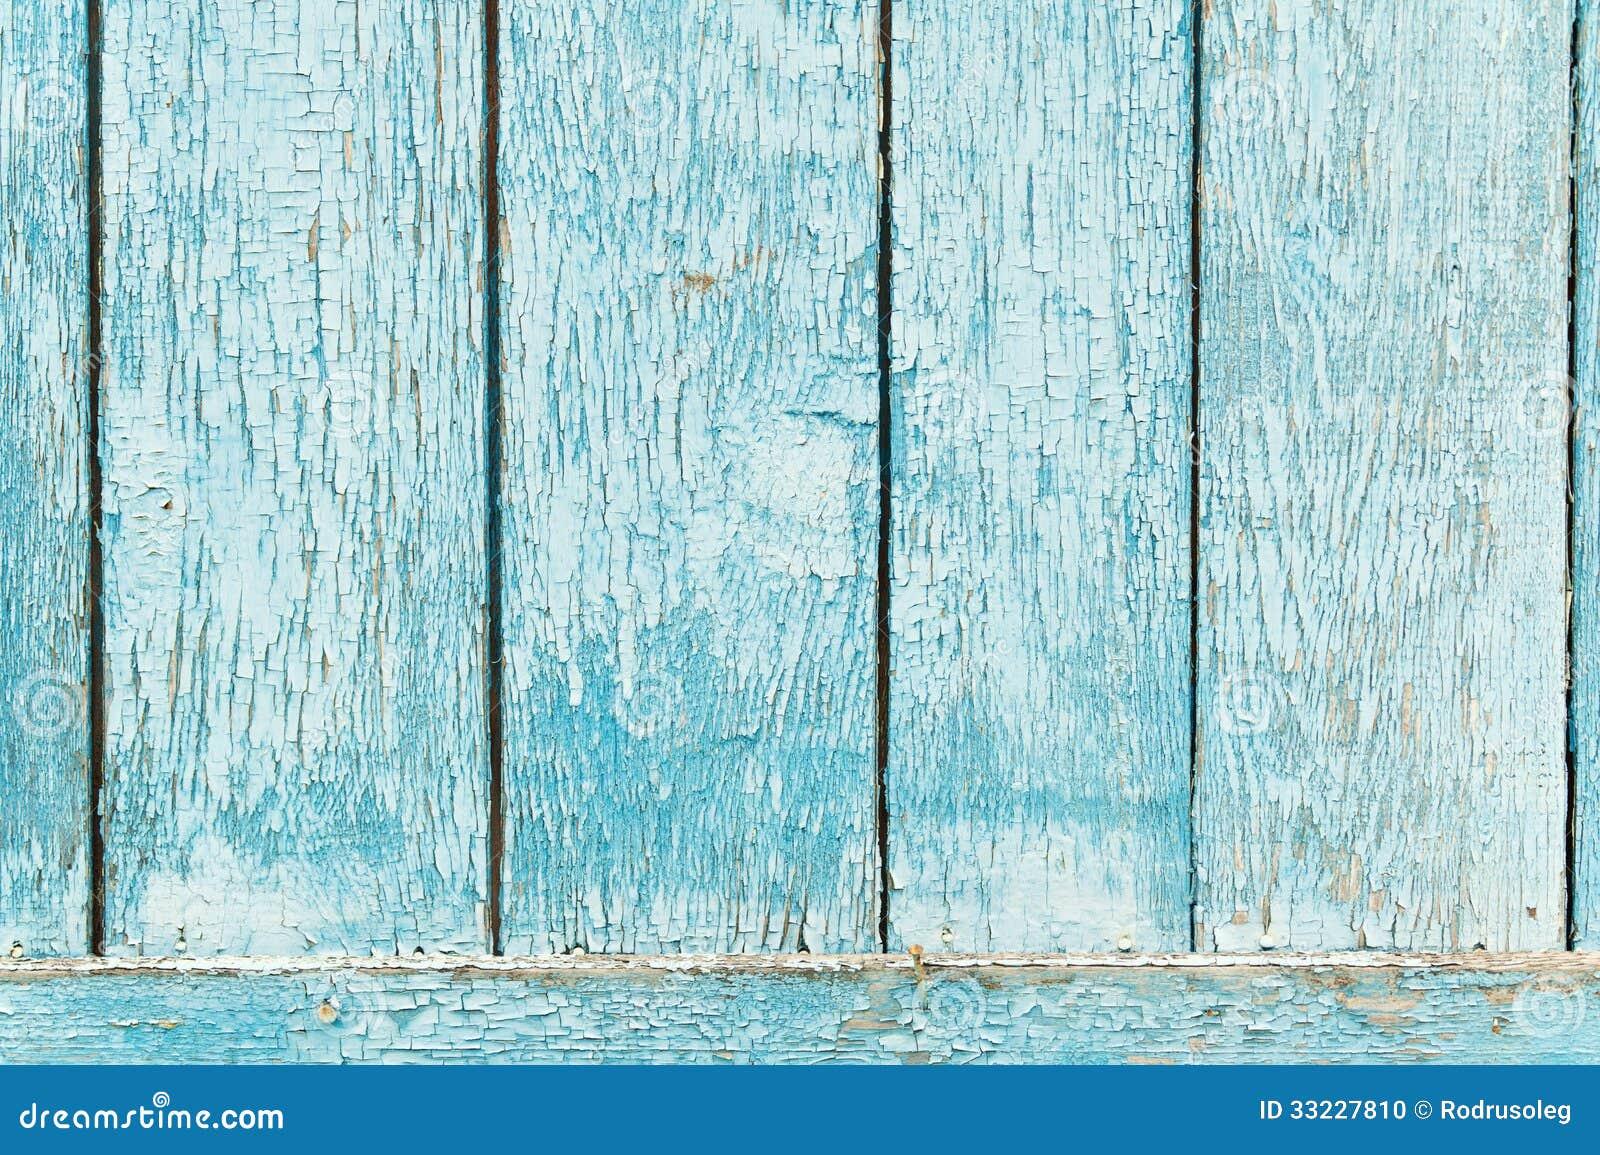 vintage blue wood background - photo #20